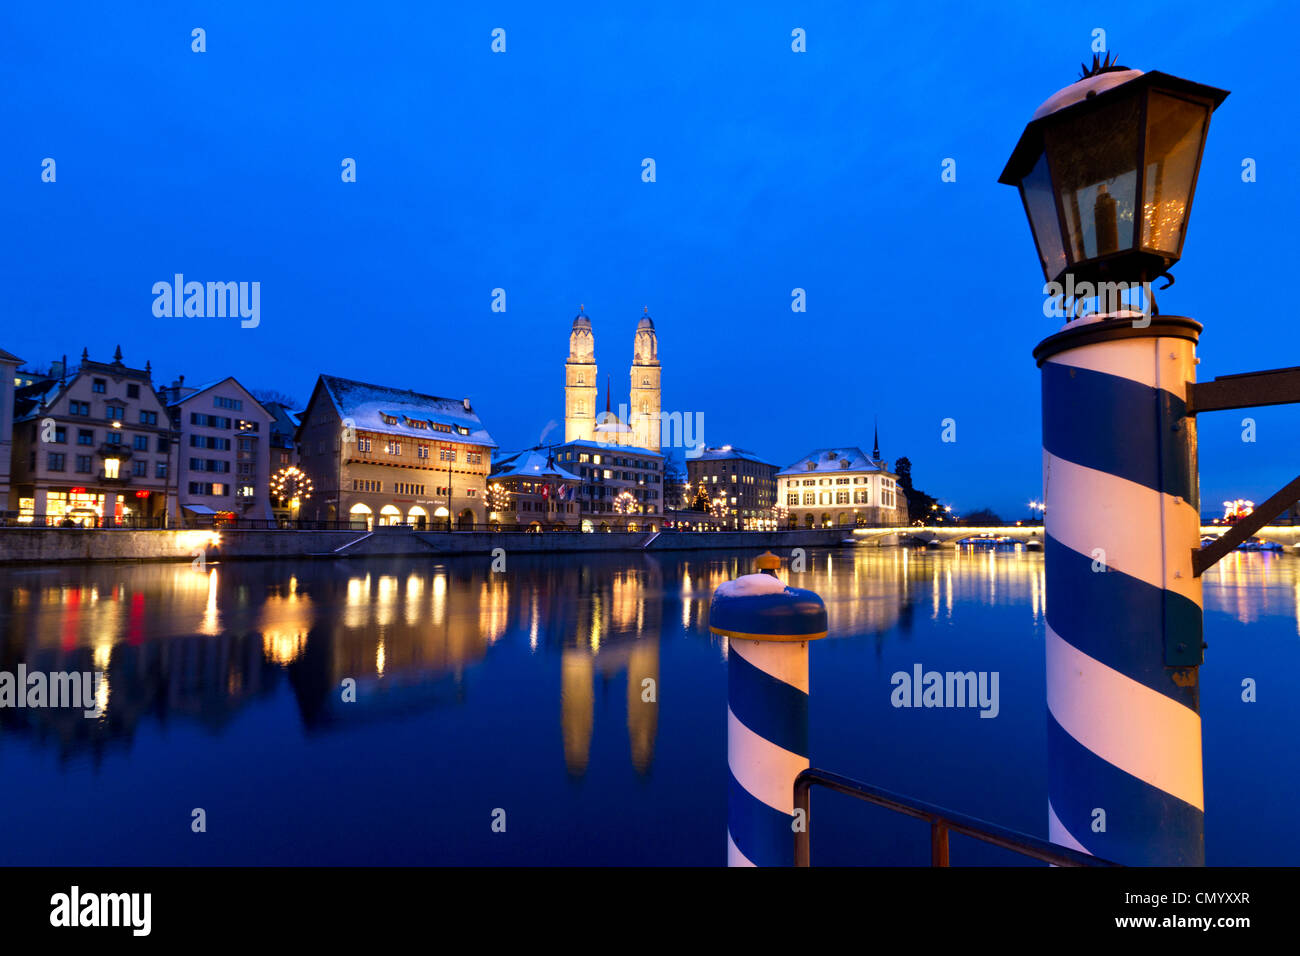 Pier at the Hotel Storchen, old town center, river Limmat at night, Limmatquai Grossmunster, Zurich, Switzerland - Stock Image